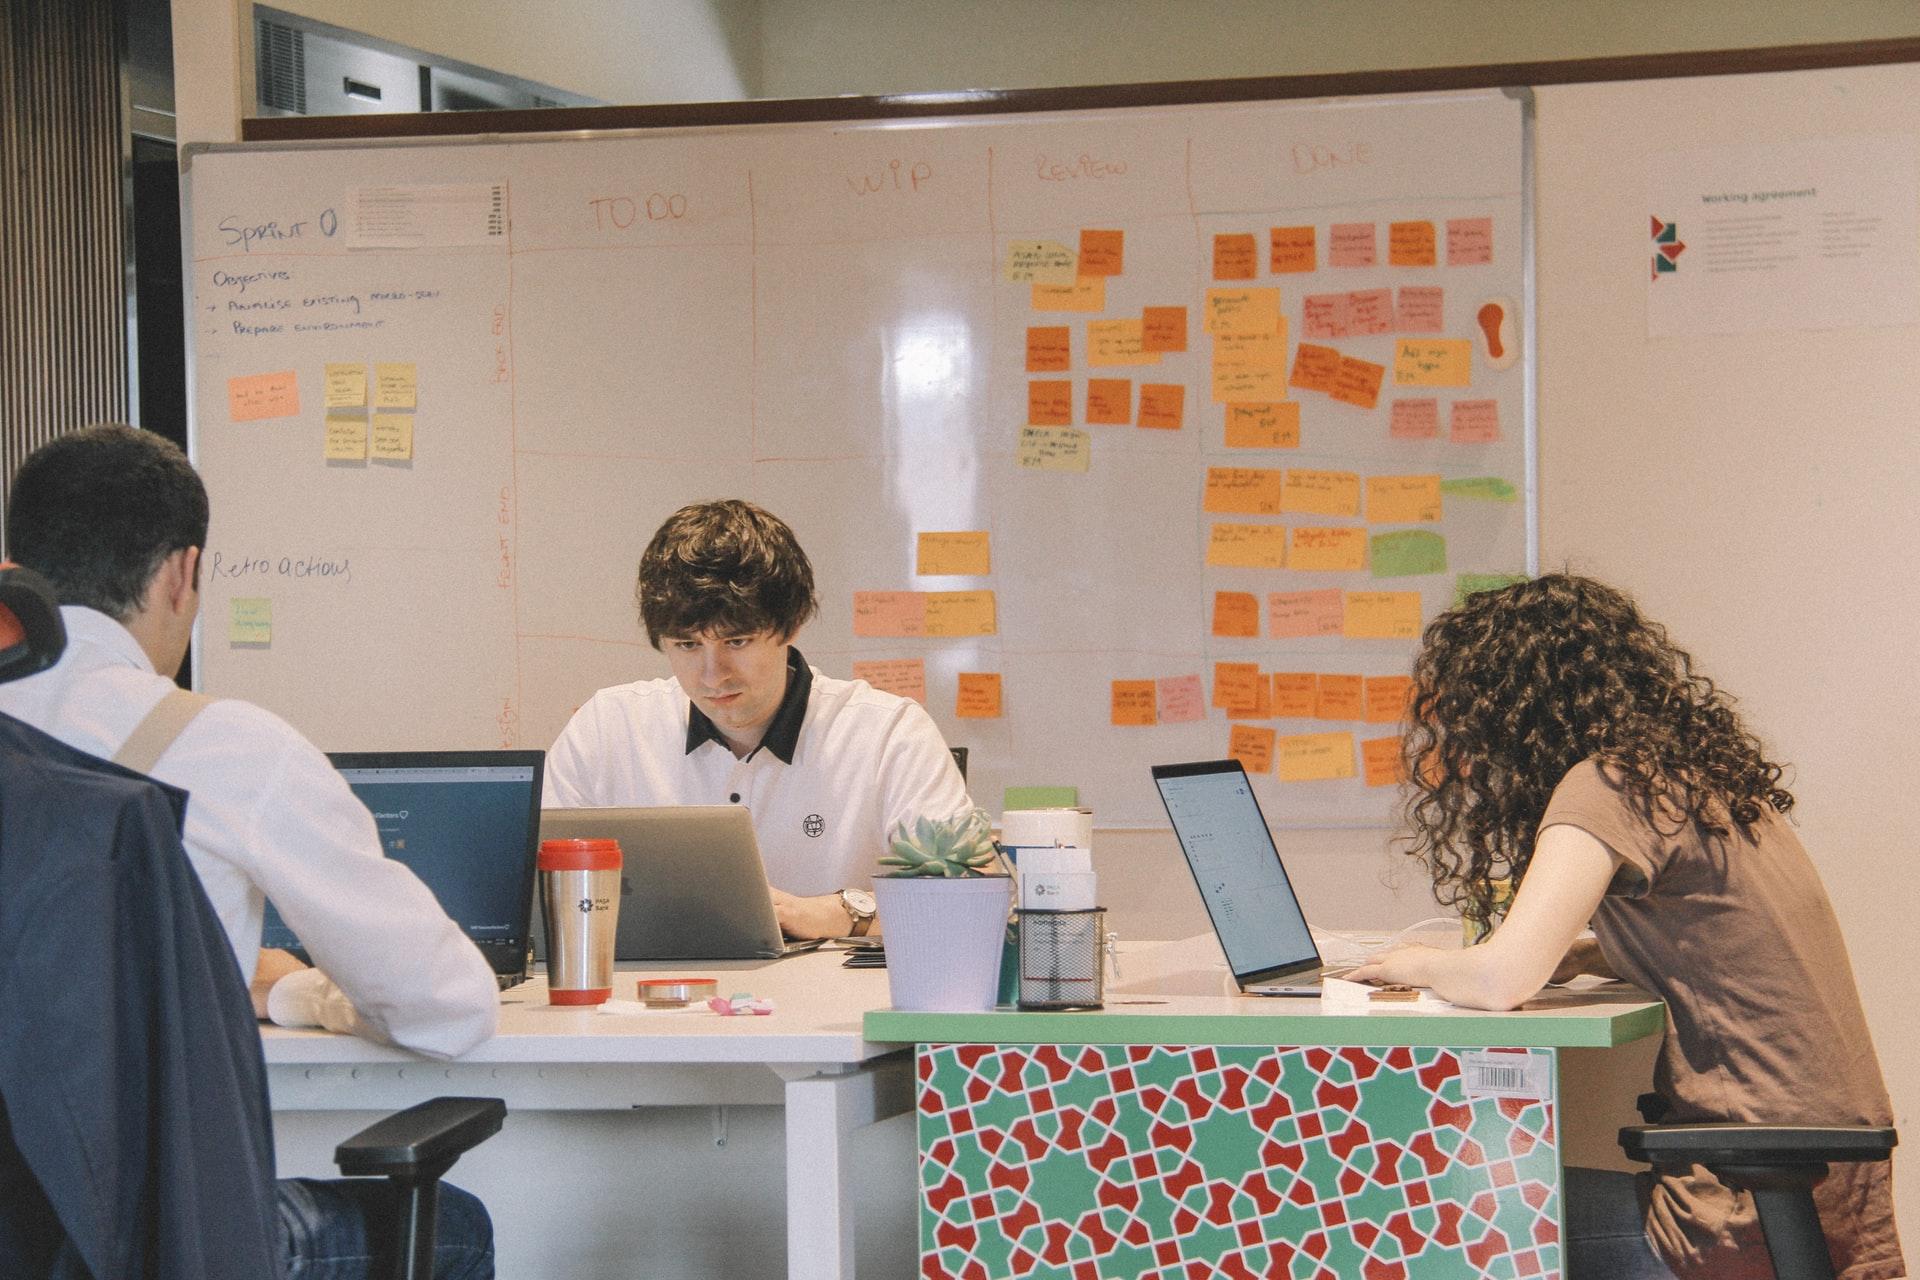 Agile Digital Marketing Guide for Software Development Companies